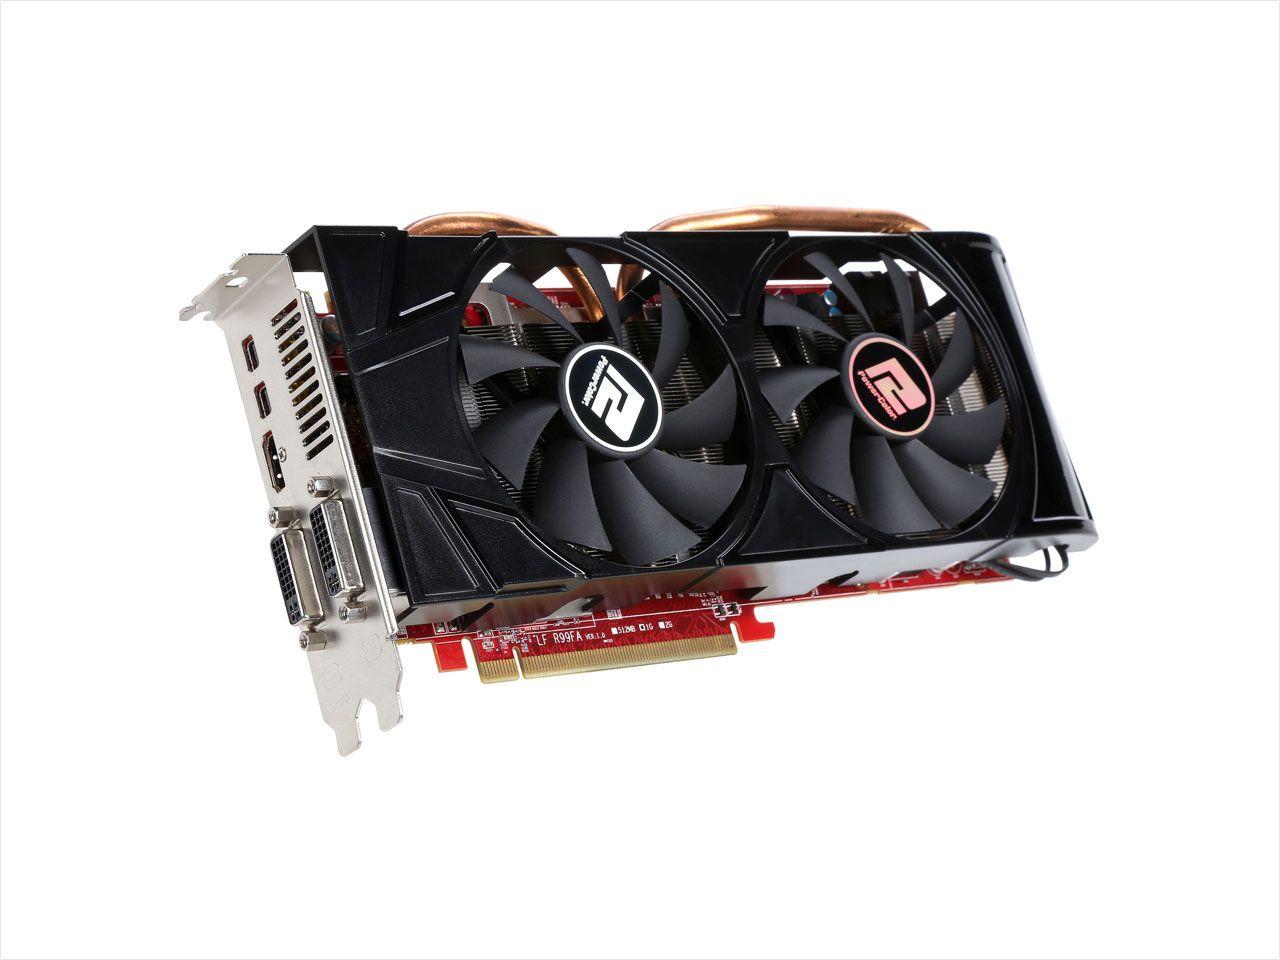 1GB PowerColor Radeon HD 6950 AX6950 GDDR5 Video Graphics Card (NEW) $49.99 AR + Free Shipping @ NeweggFlash